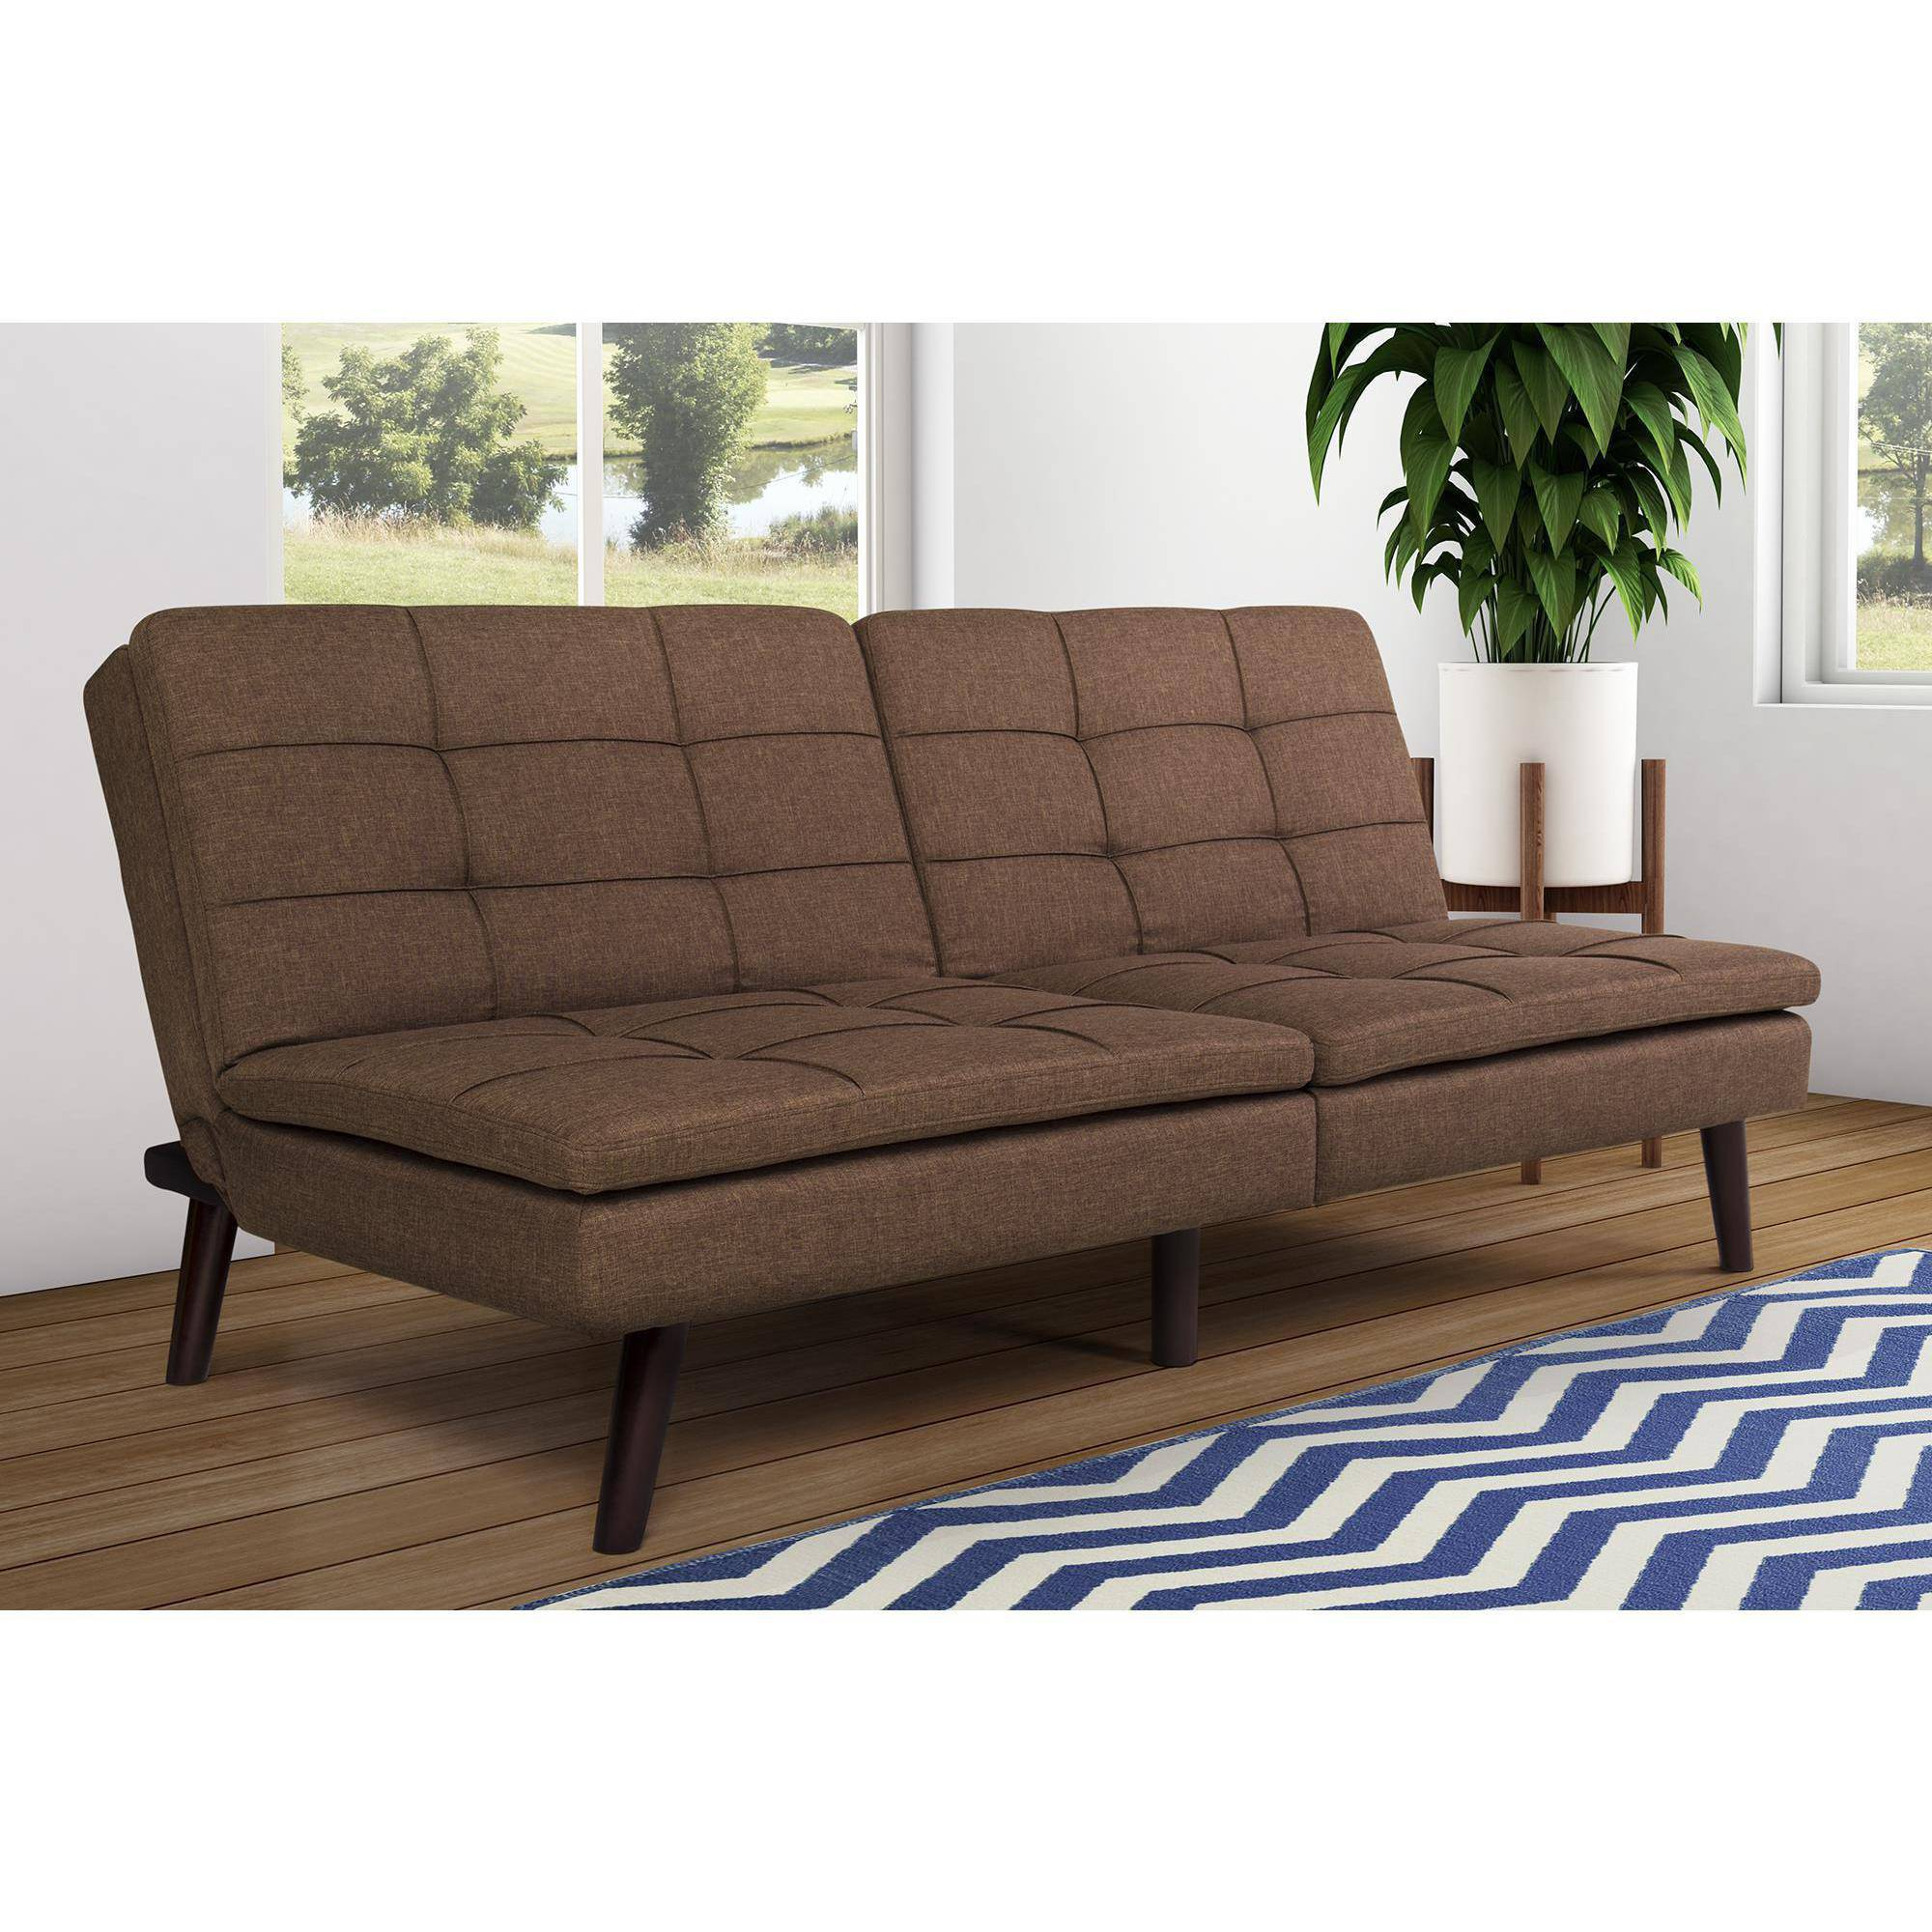 DHP Premium Westbury Linen Pillowtop Futon, Brown by Dorel Home Products